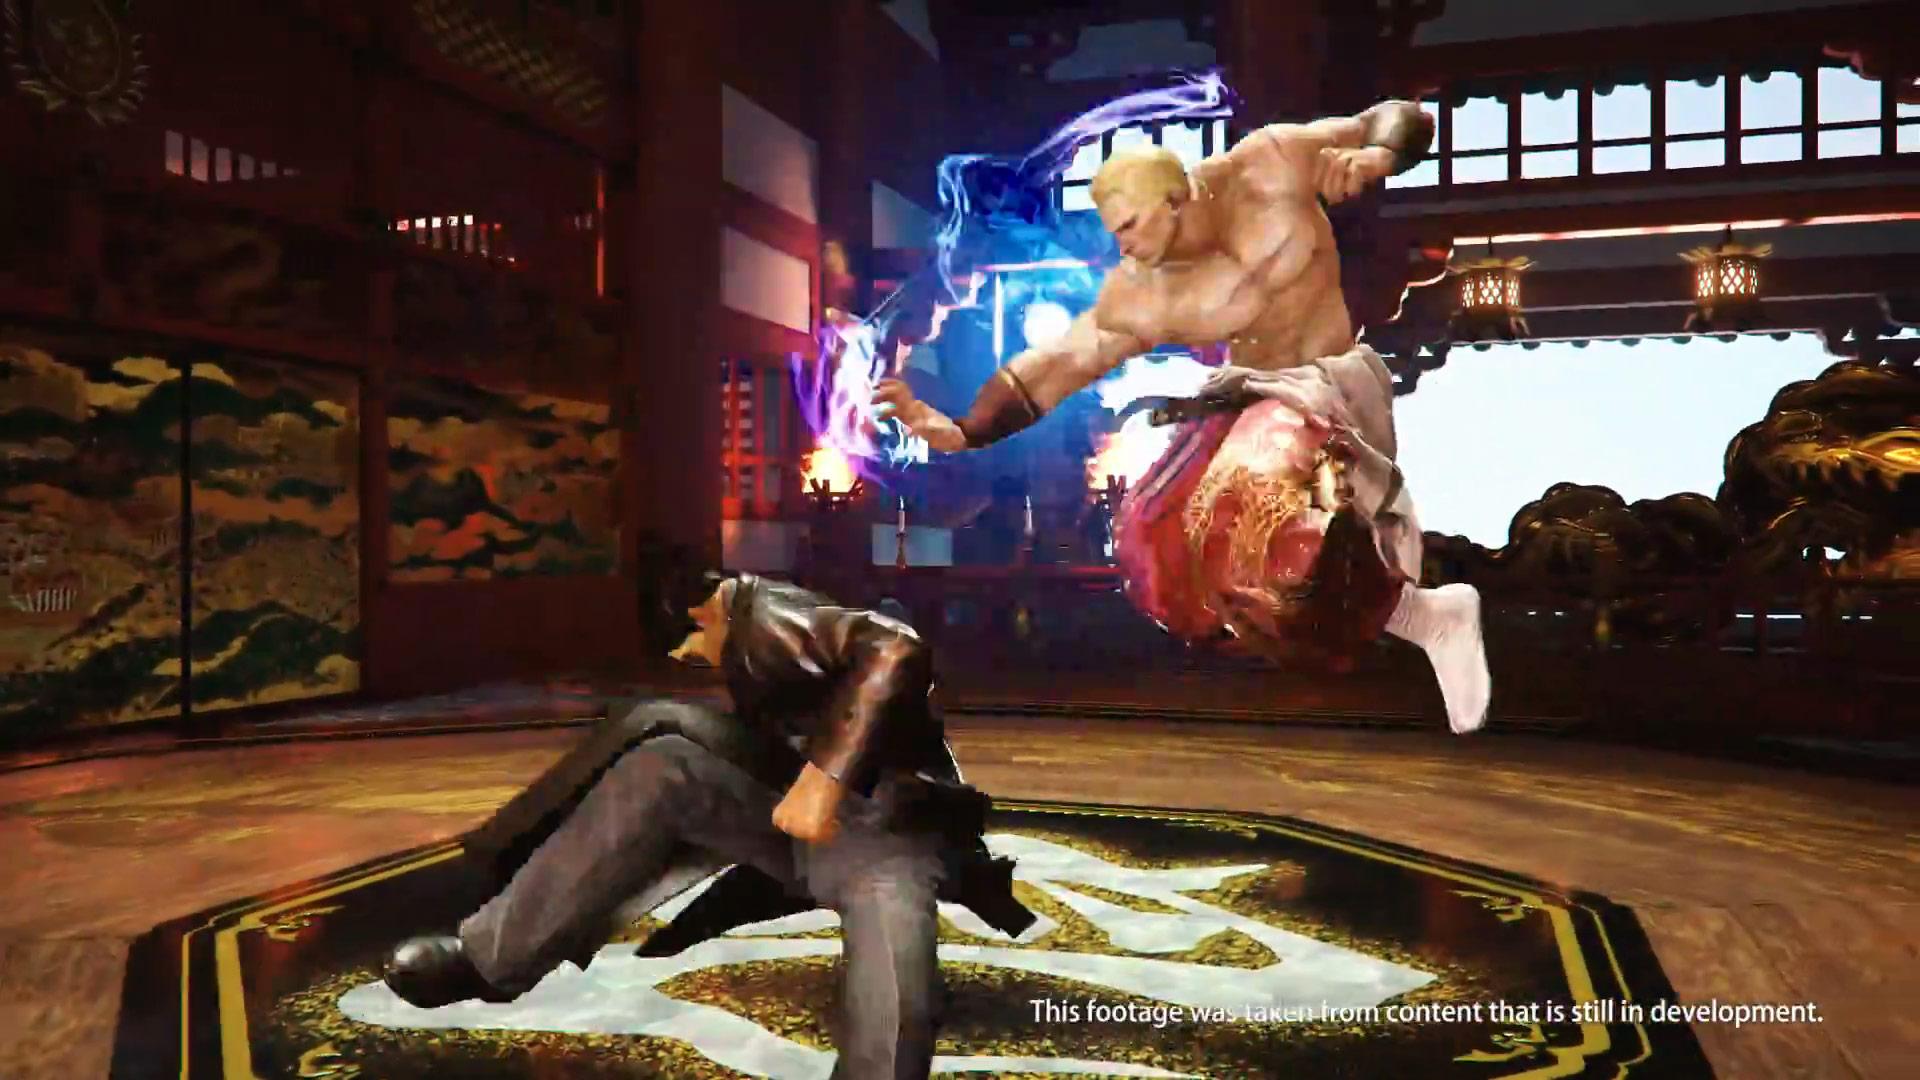 Geese Howard Tekken 7 screen shots 8 out of 9 image gallery